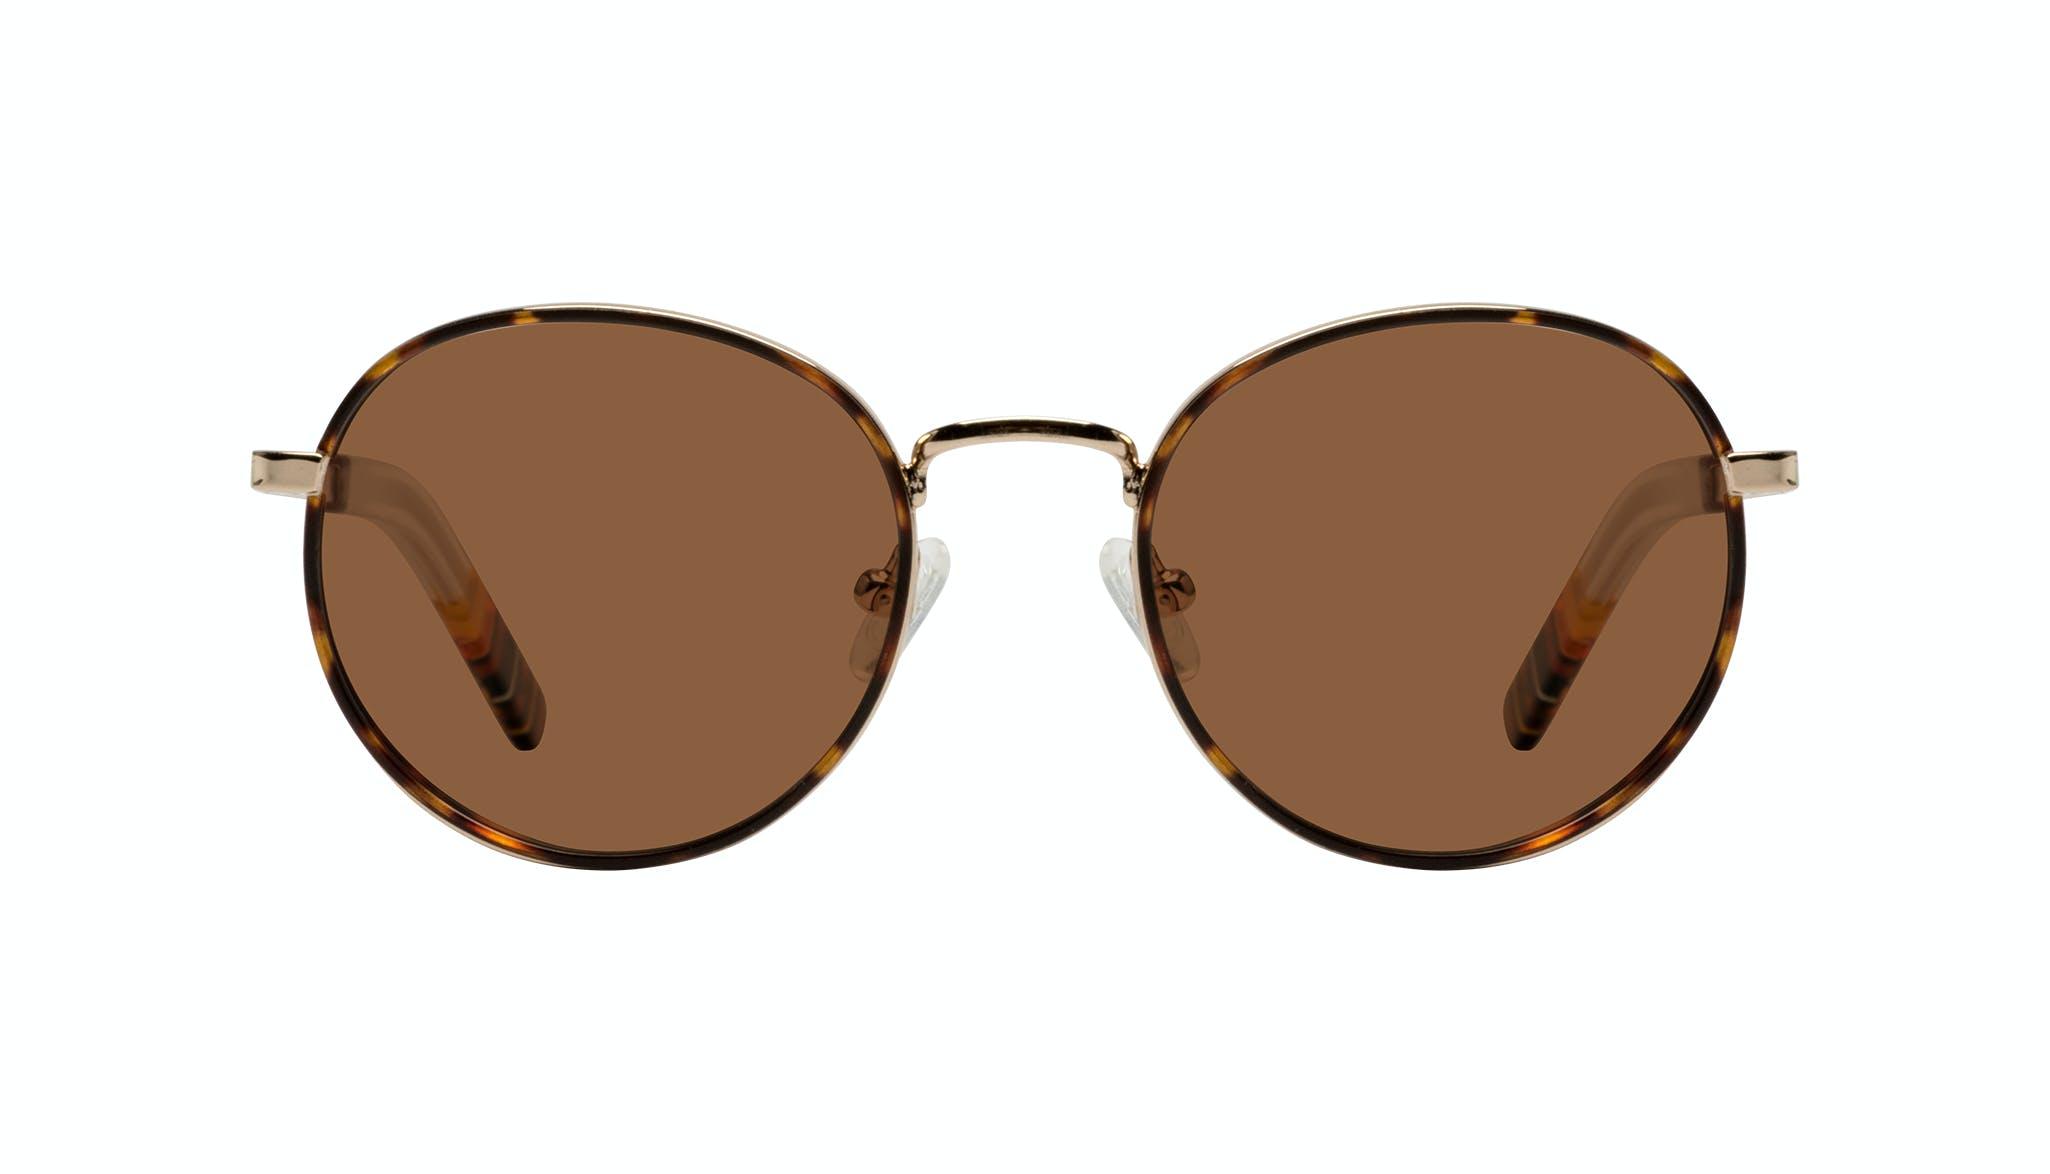 Affordable Fashion Glasses Round Sunglasses Men Reach Tortoise